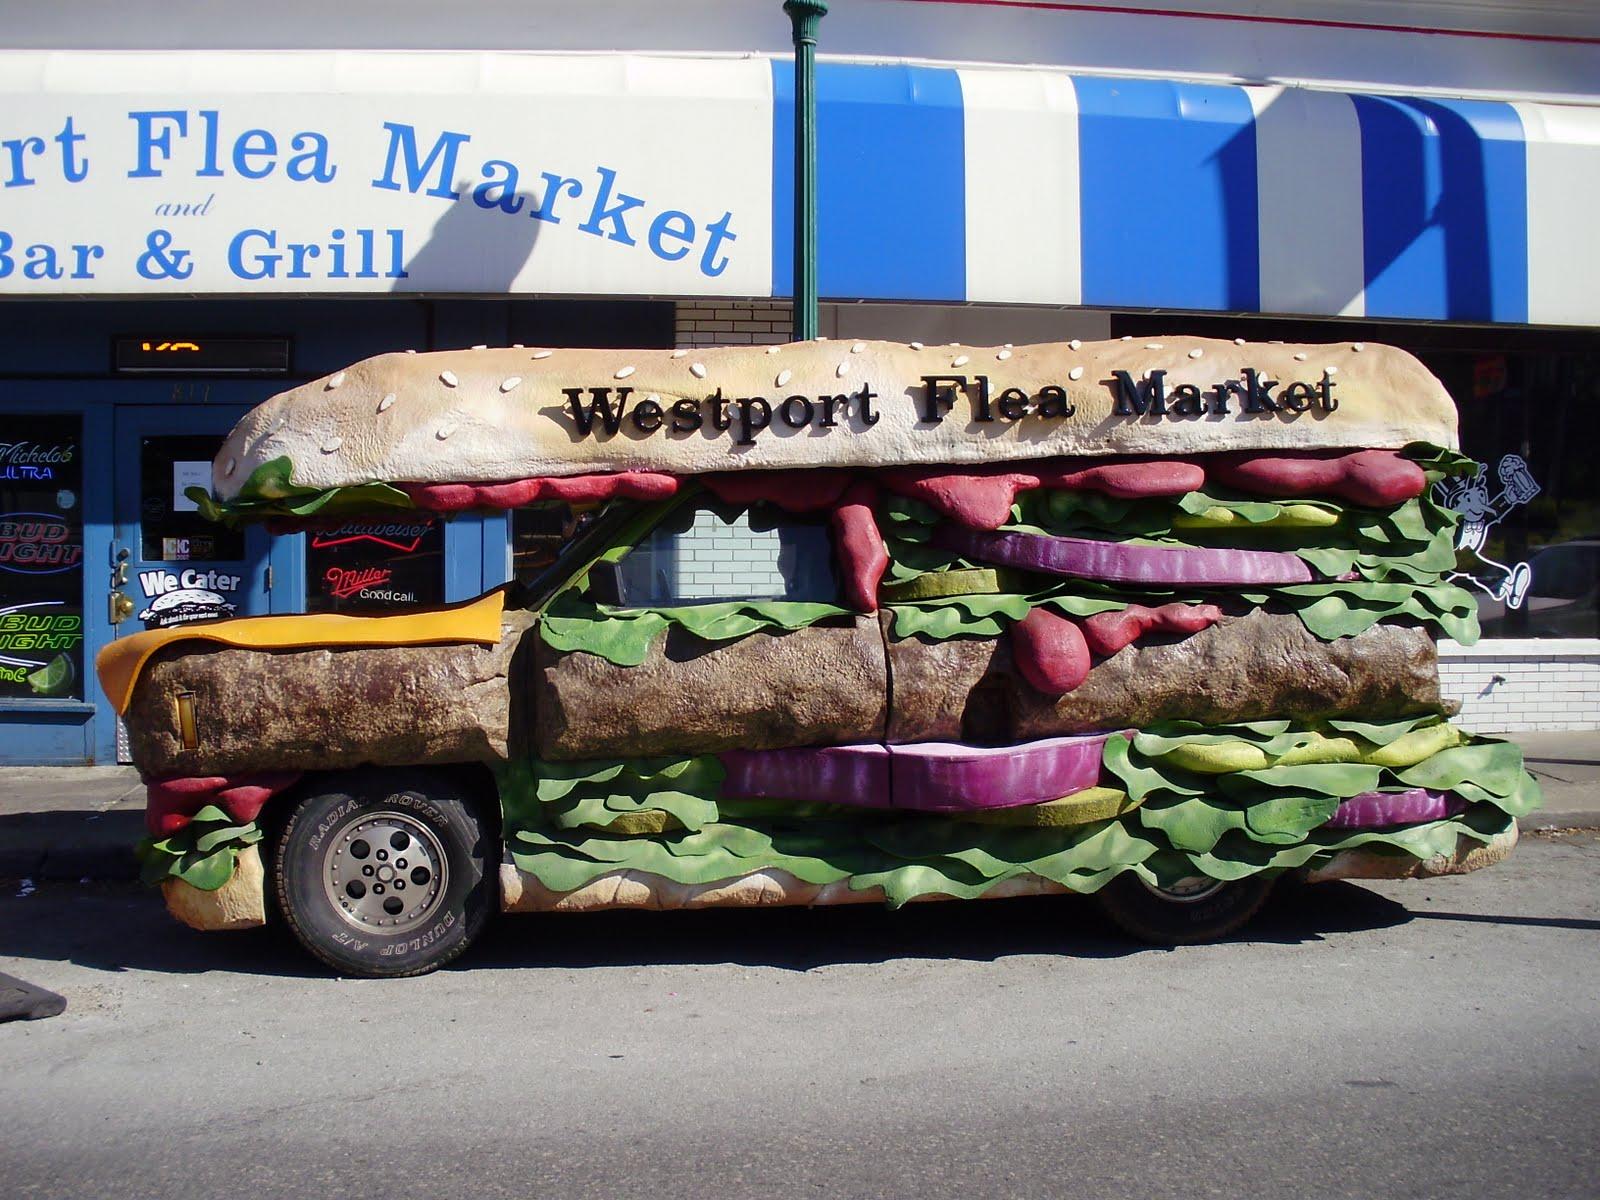 Westport Flea Market & Bar & Grill, Kansas City MO